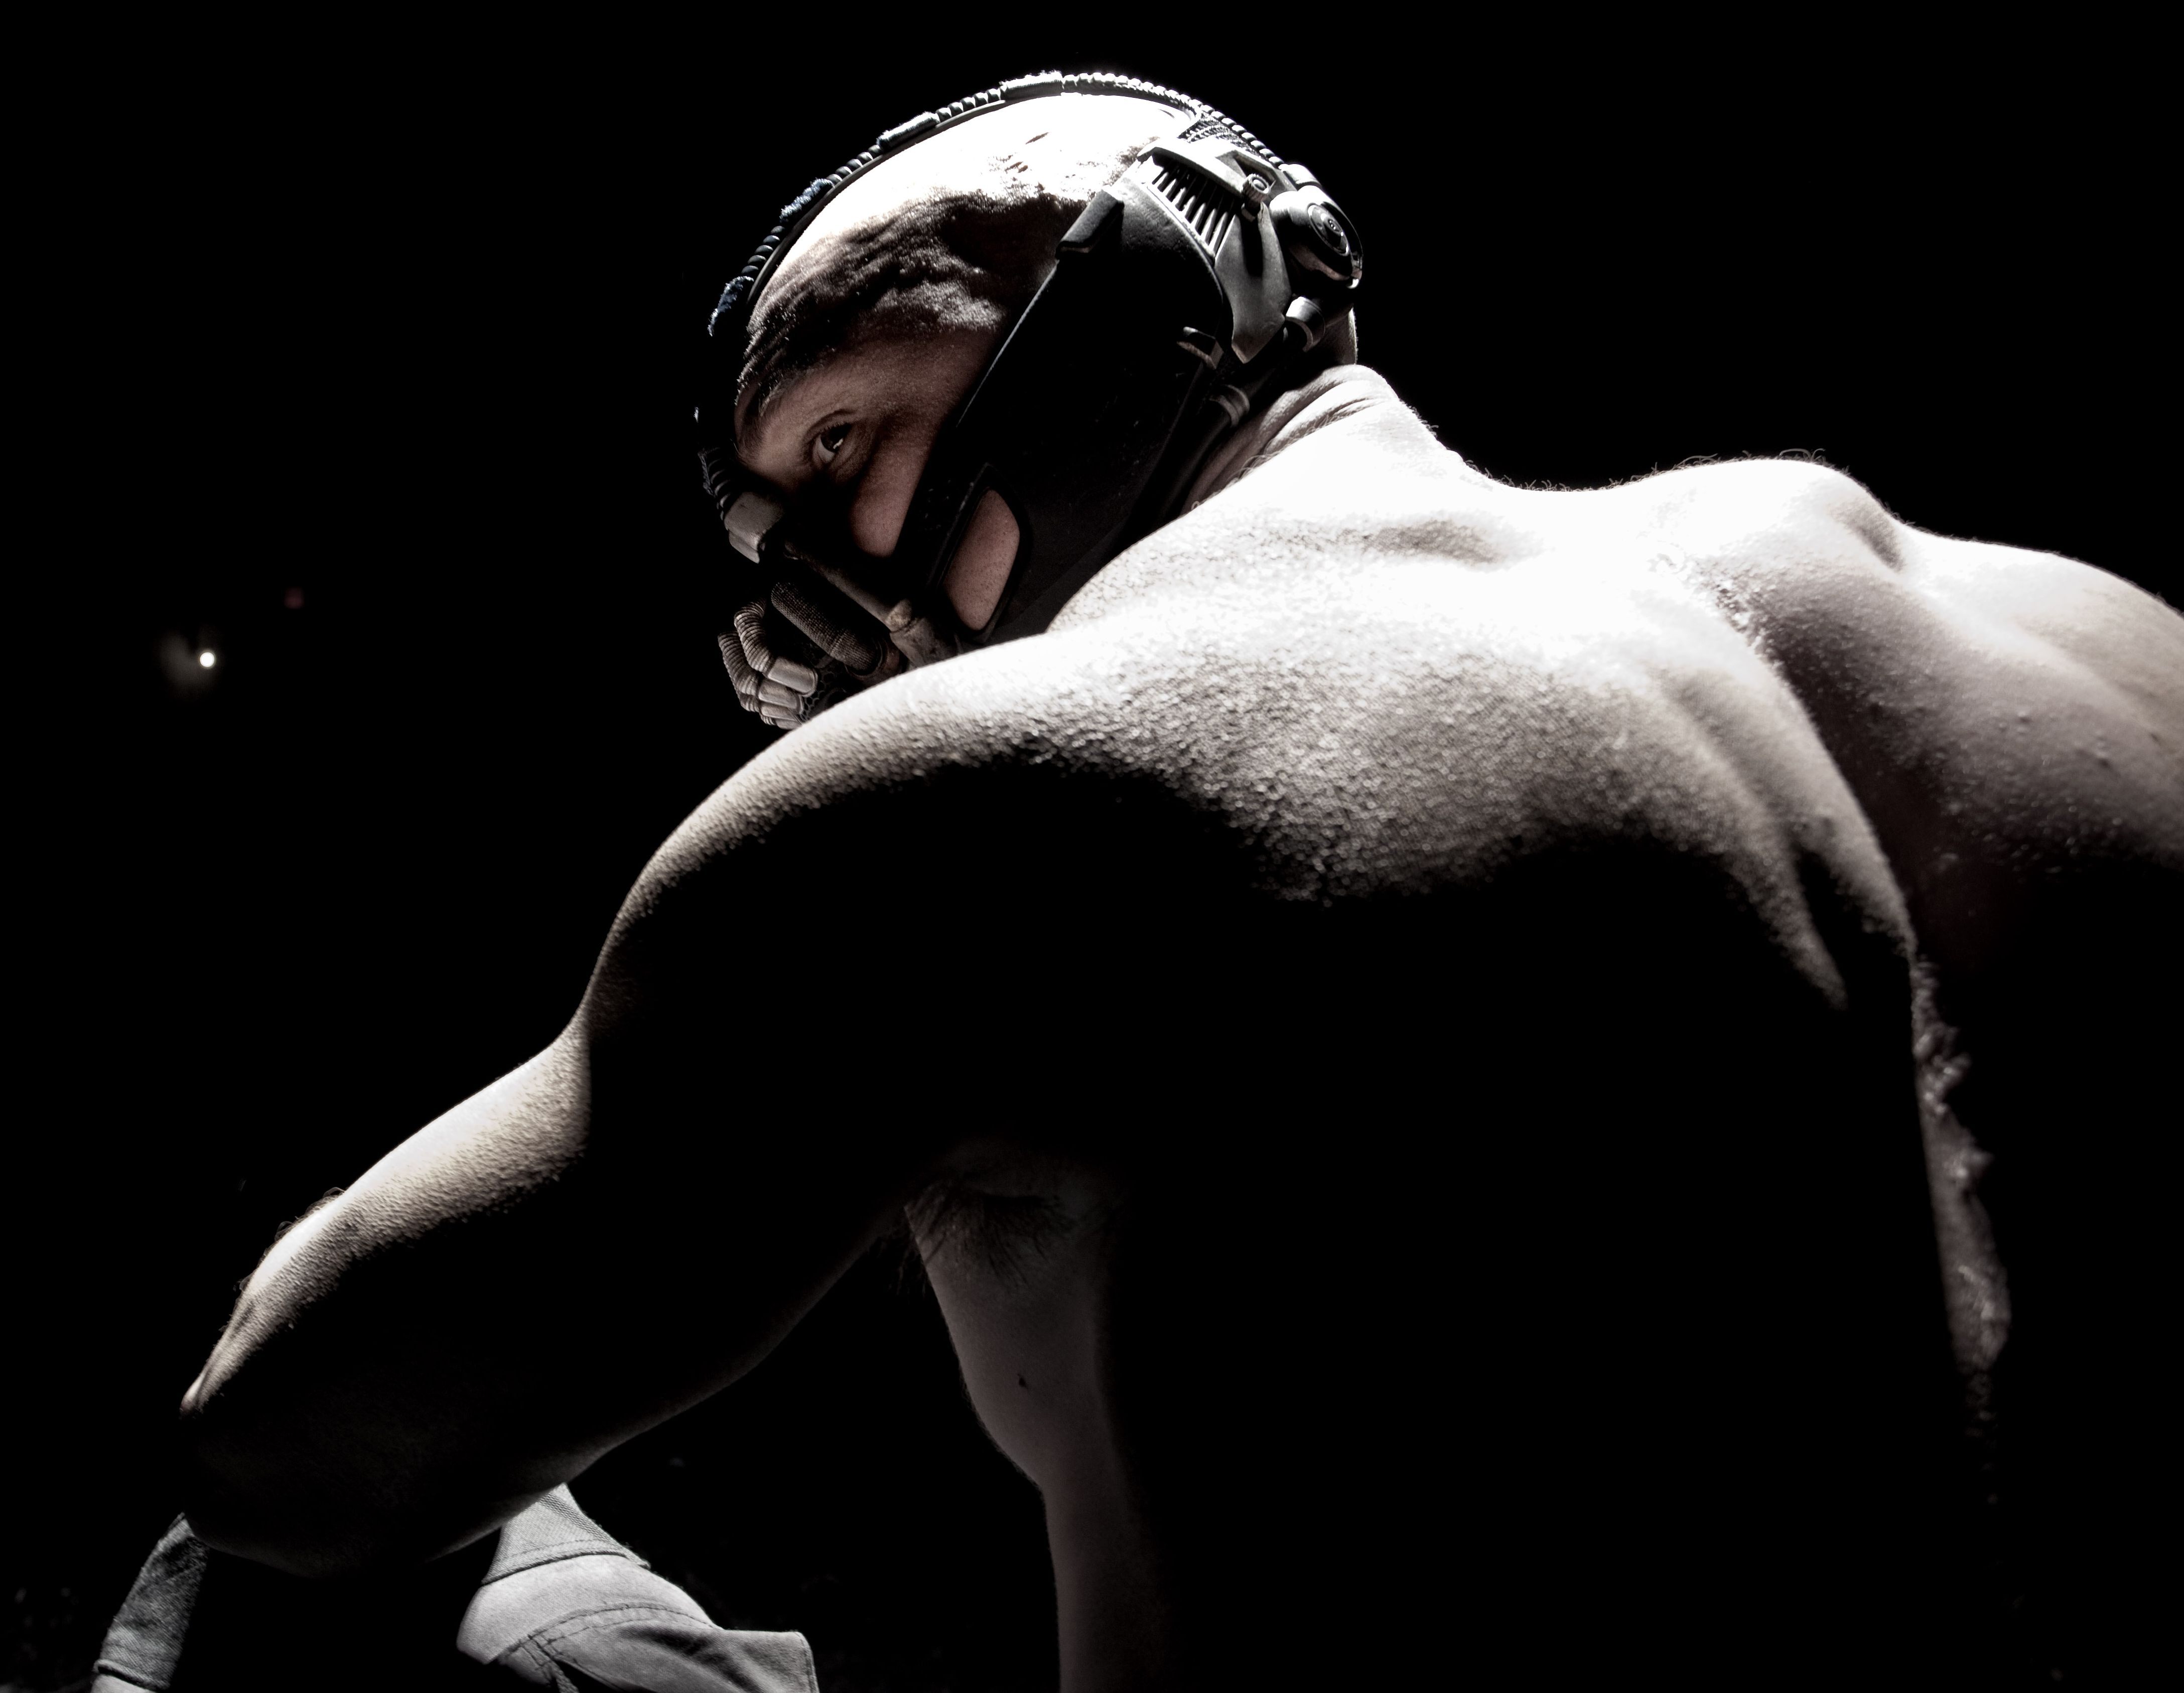 Bane's back - Tom Hardy in The Dark Knight Rises